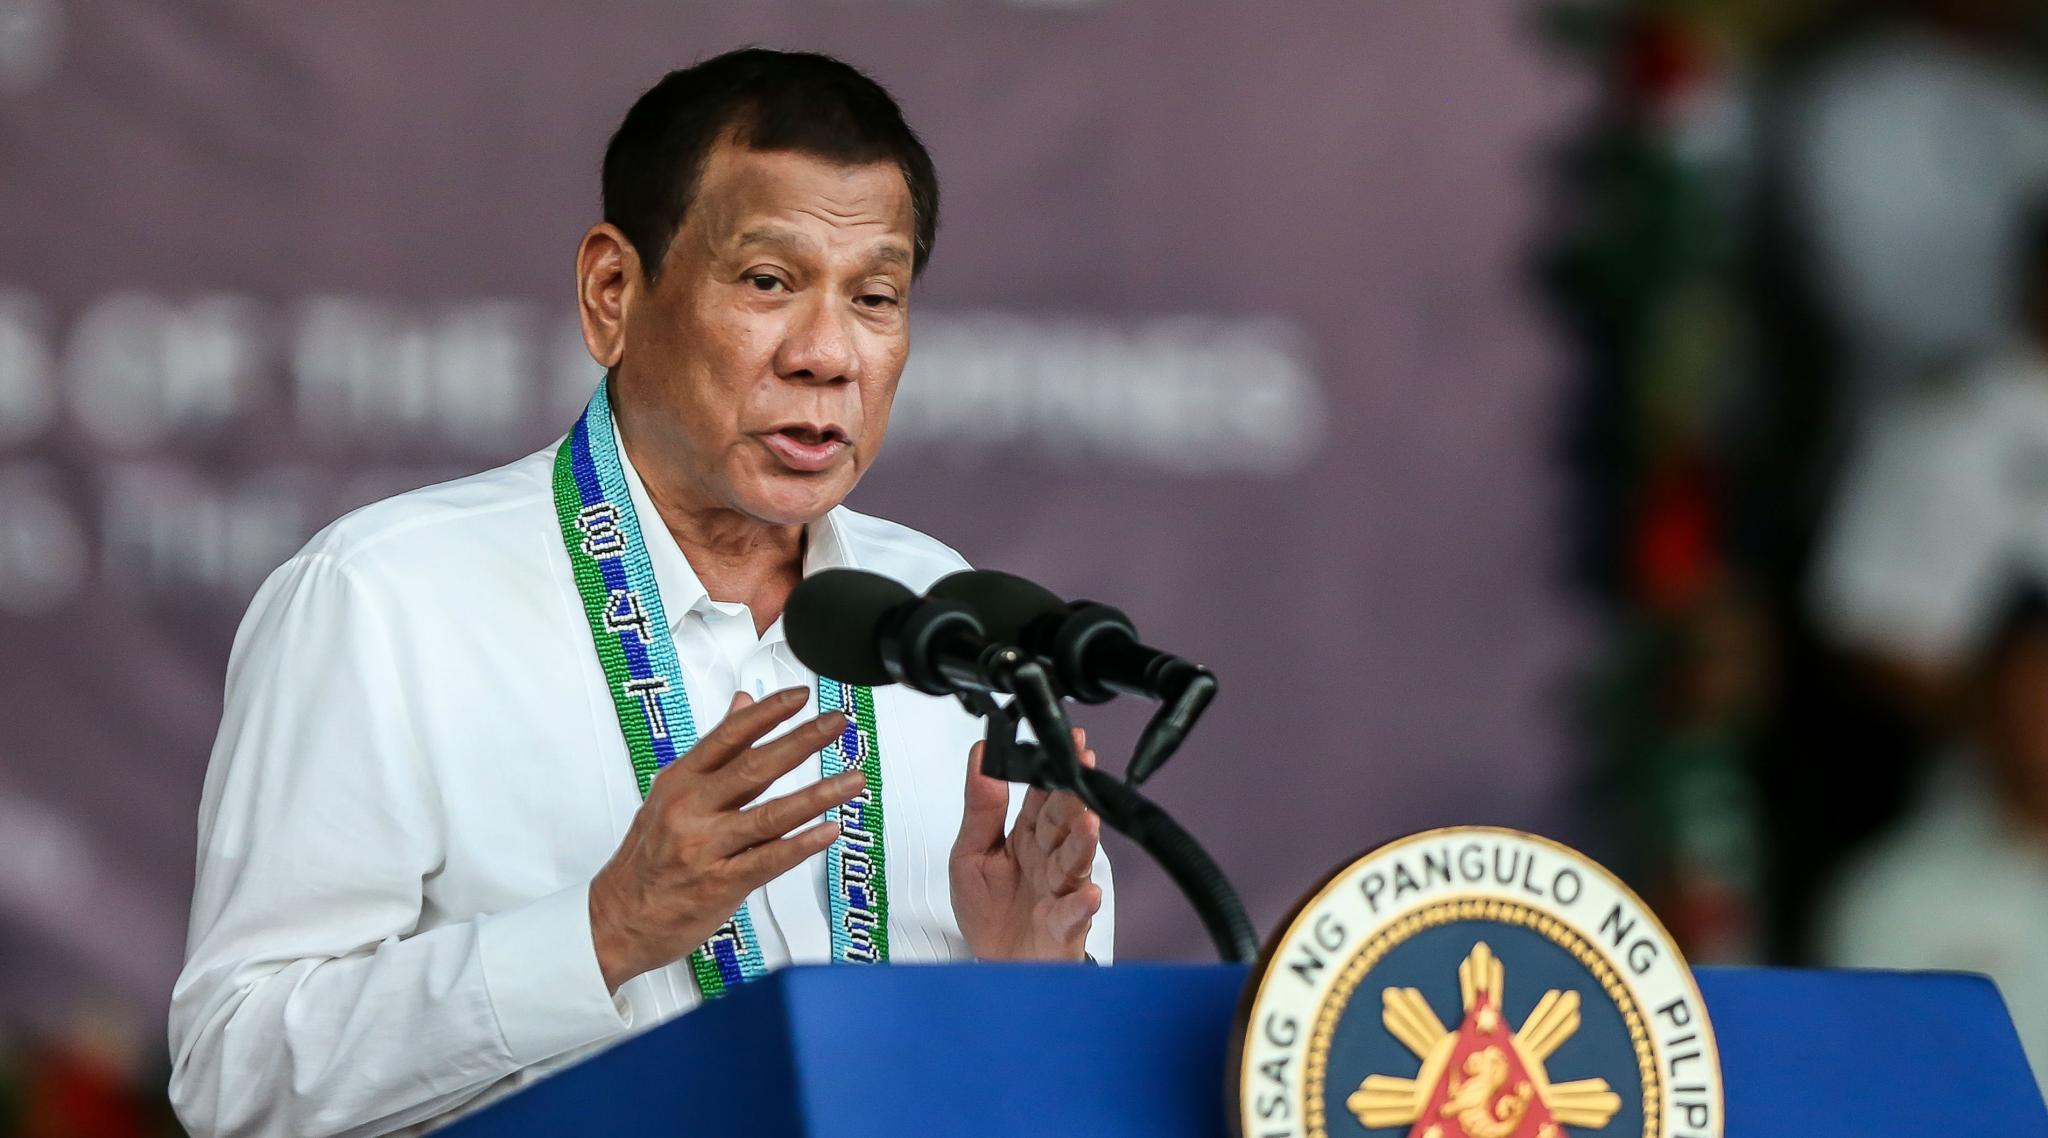 Coronavirus Pandemic: Philippines President Rodrigo Duterte Orders Police to Shoot Quarantine Violators